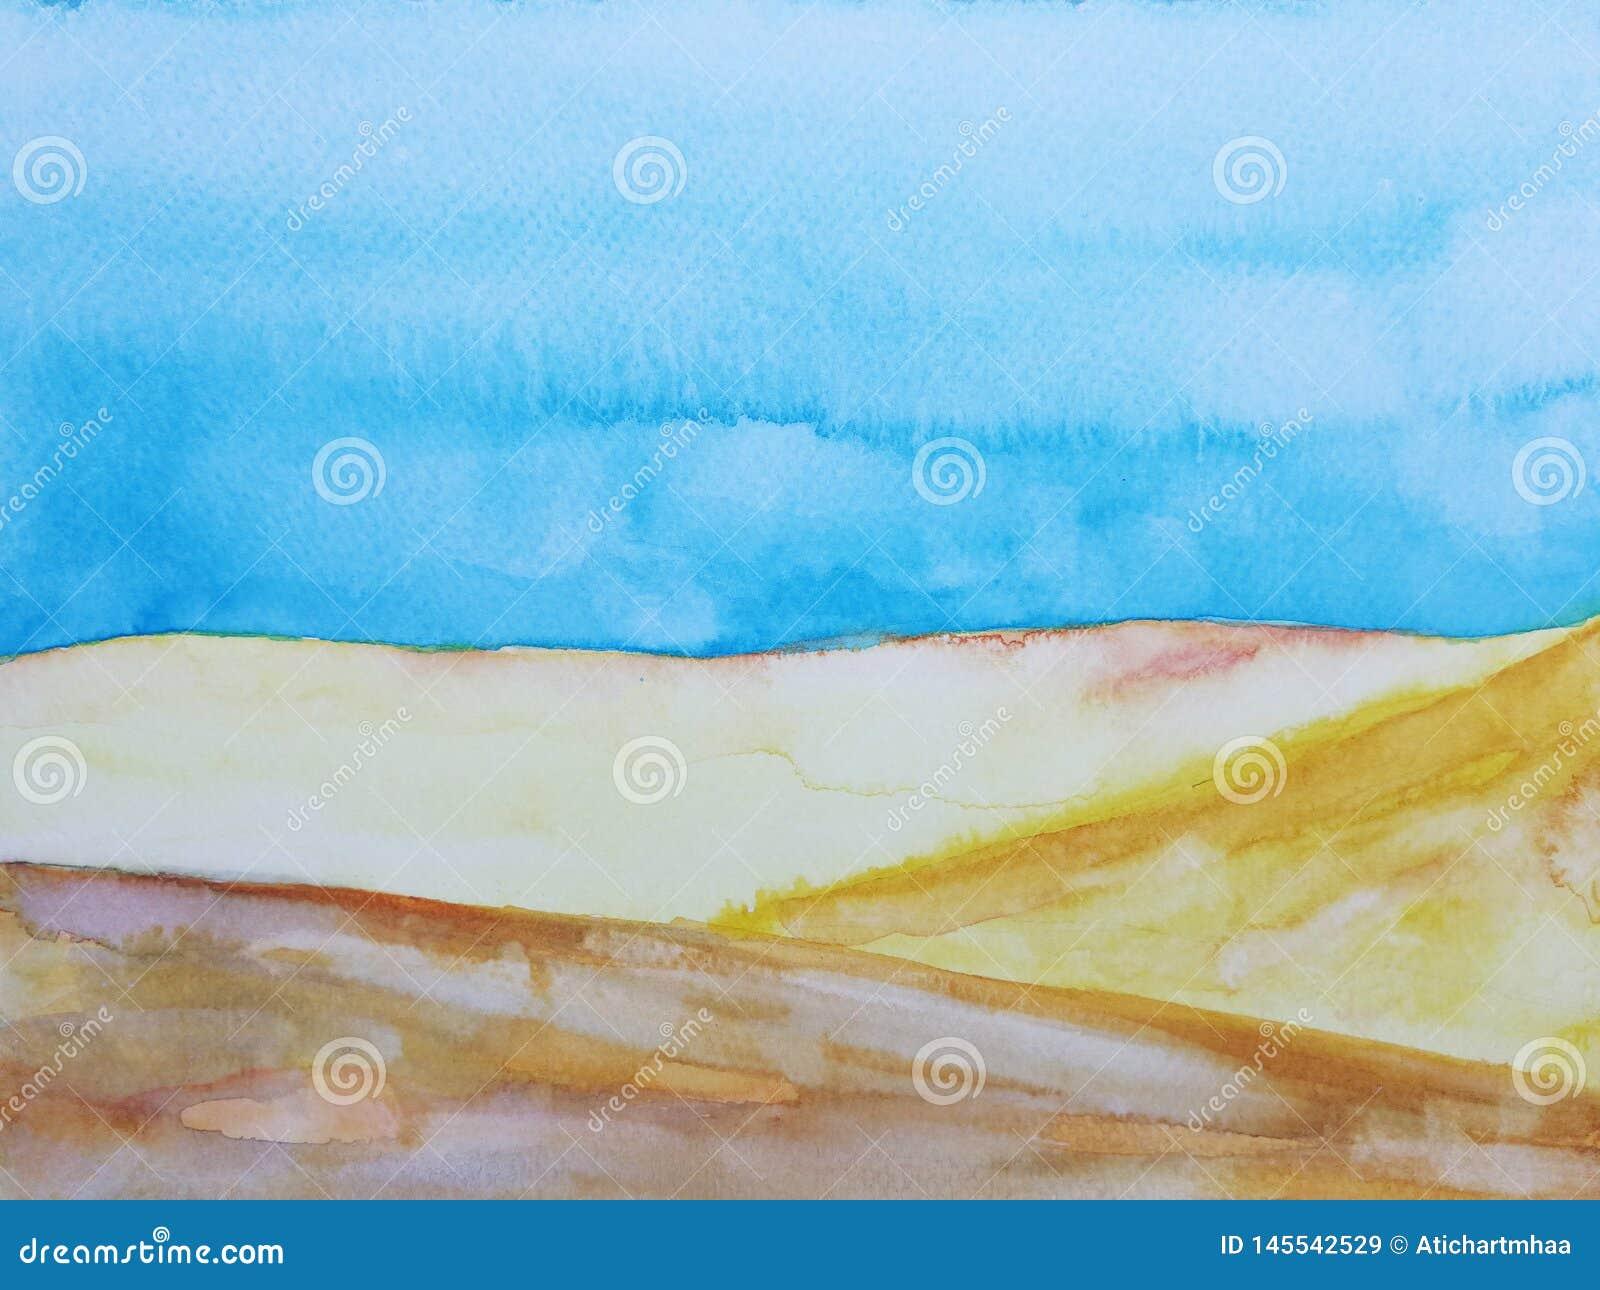 Watercolor hand drawn illustration landscape desert